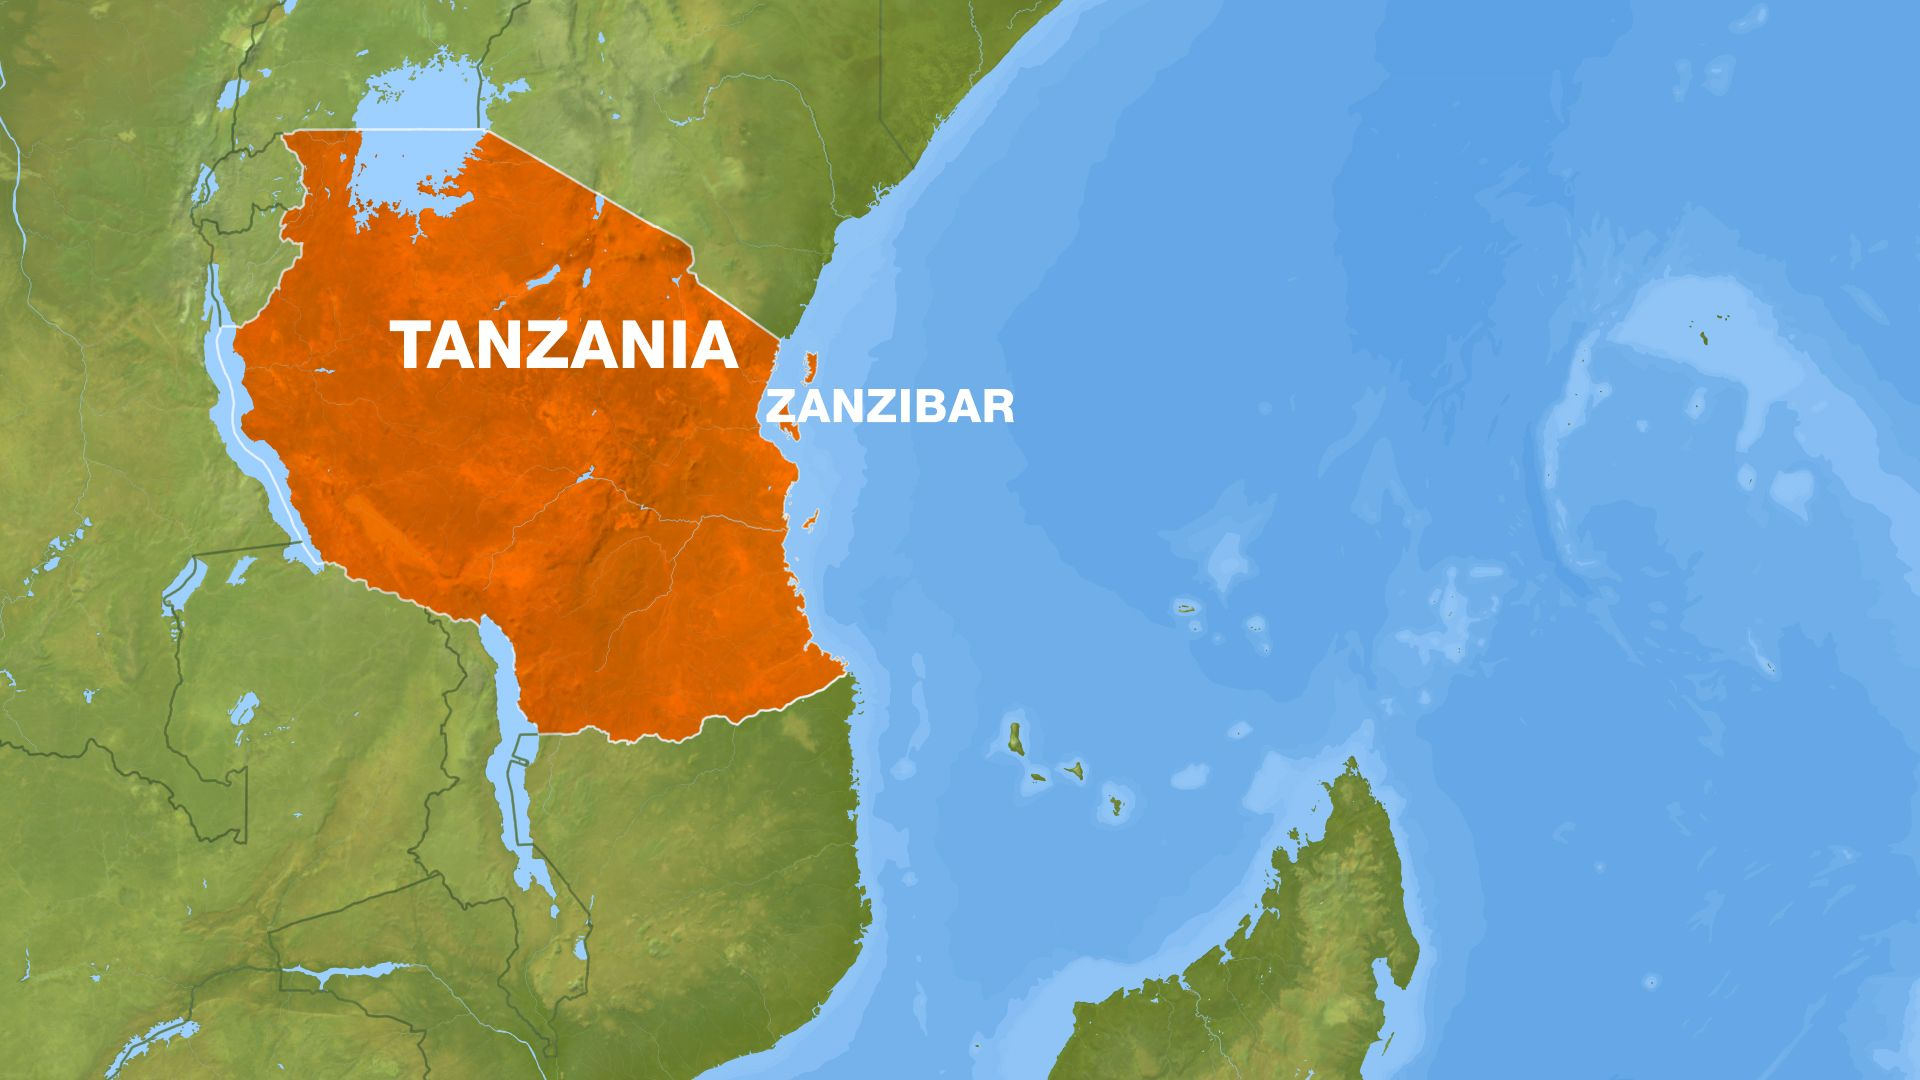 Deadly bombing hits zanzibar news al jazeera gumiabroncs Gallery